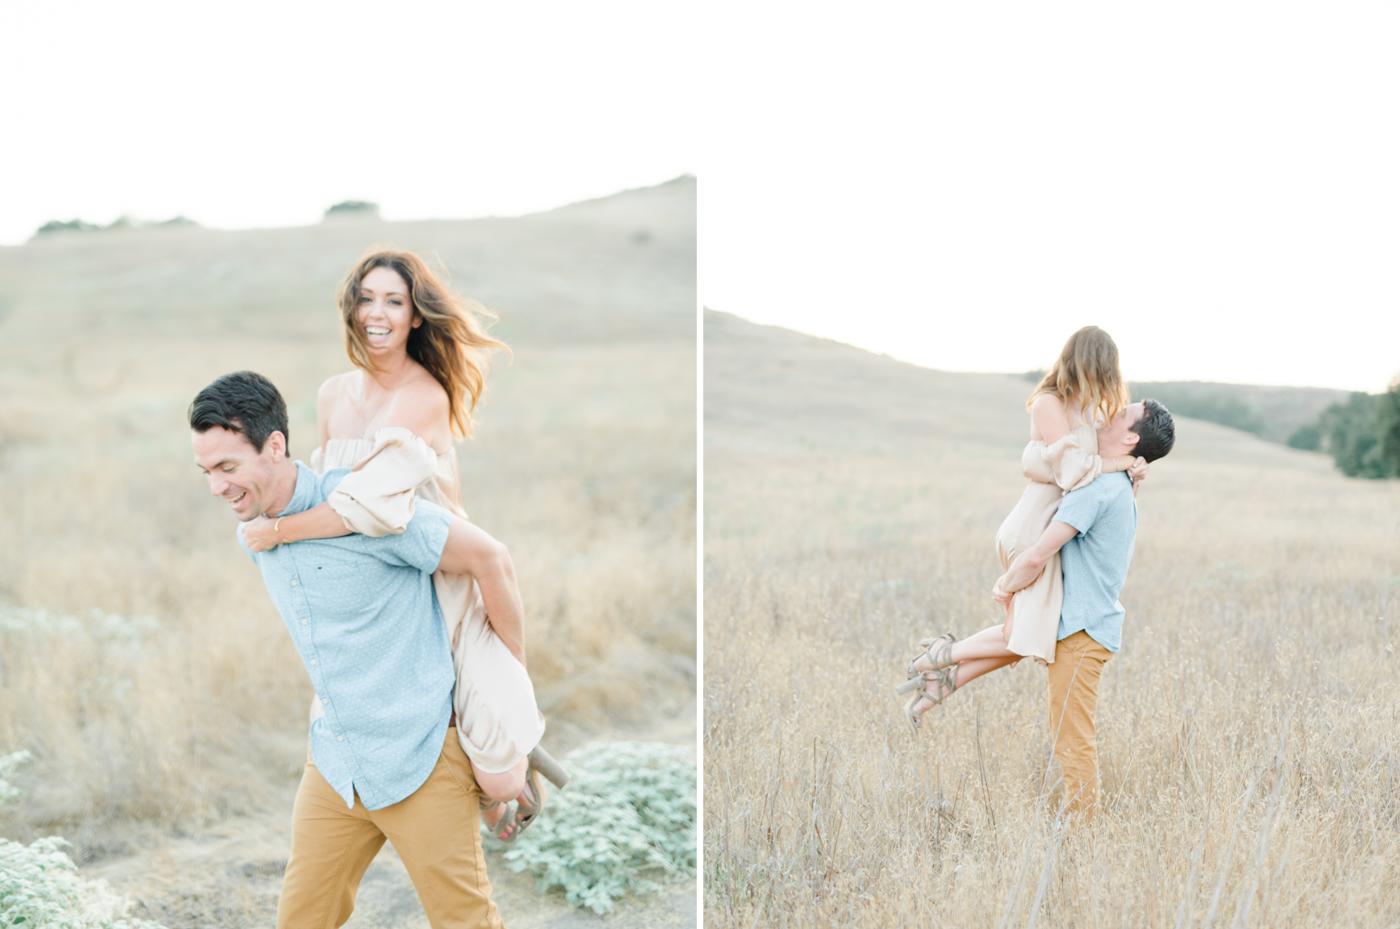 Malibu_Creek_State_Park_Romantic_Engagement_Session_C&J_romantic-1.jpg